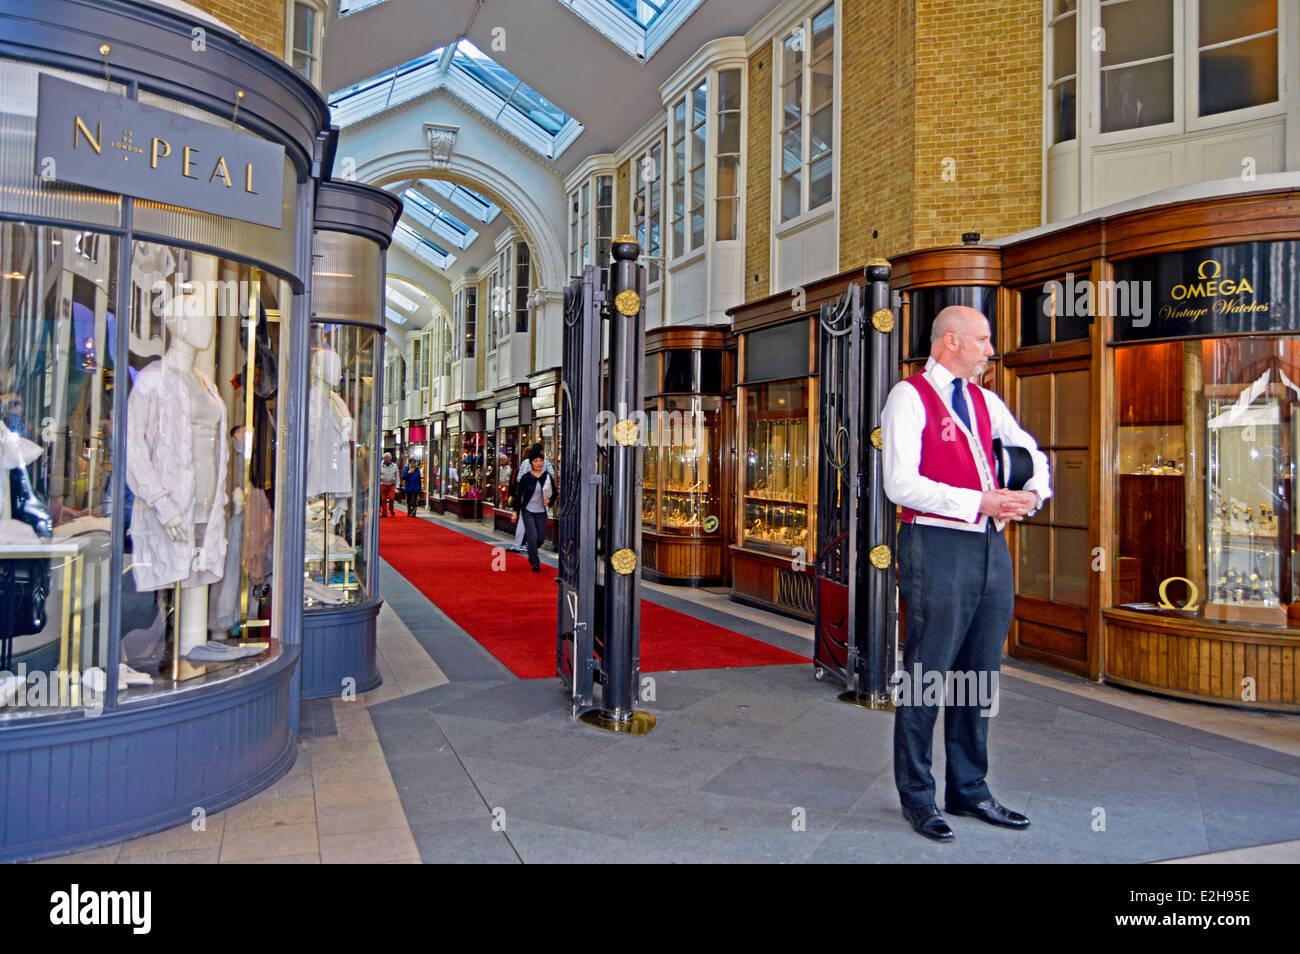 Burlington Arcade Beadle in traditional uniform at entrance of the Burlington Arcade, Mayfair, London, England, - Stock Image